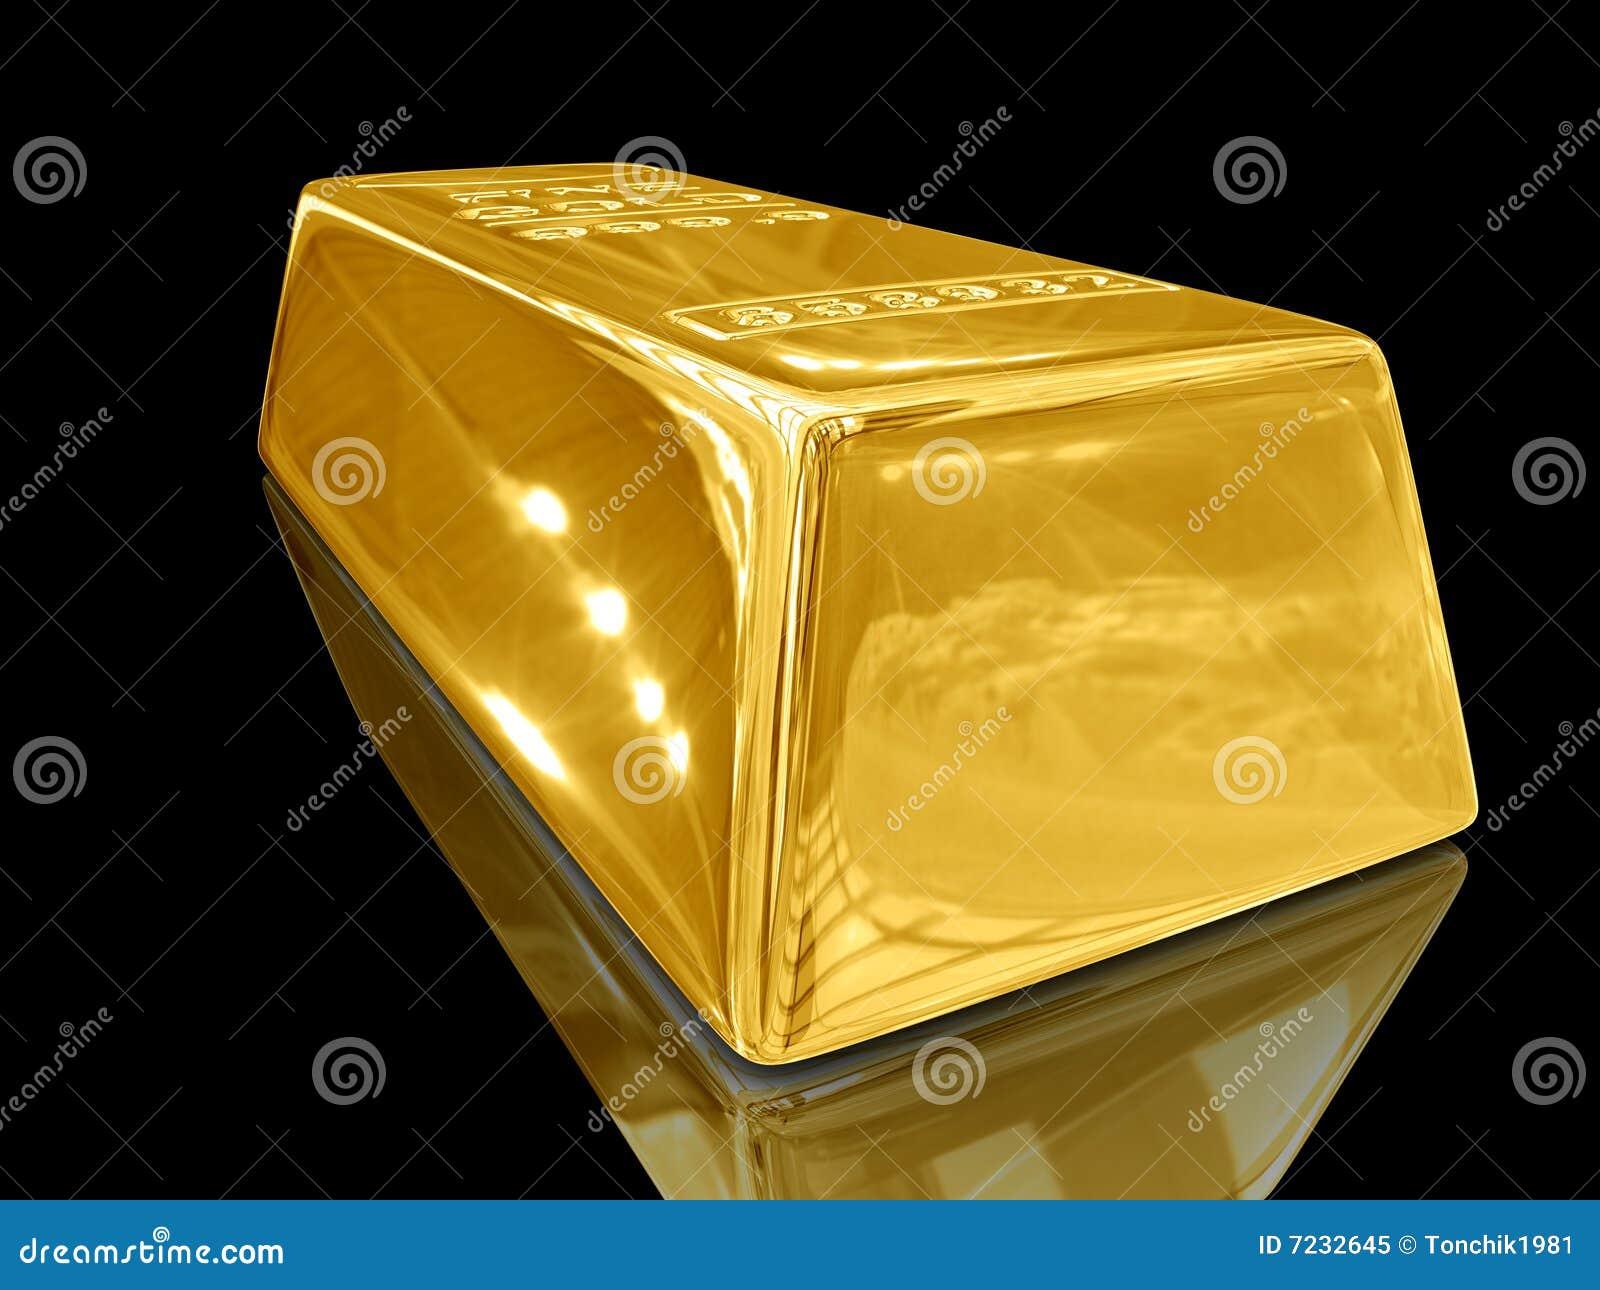 gold bar black background - photo #34